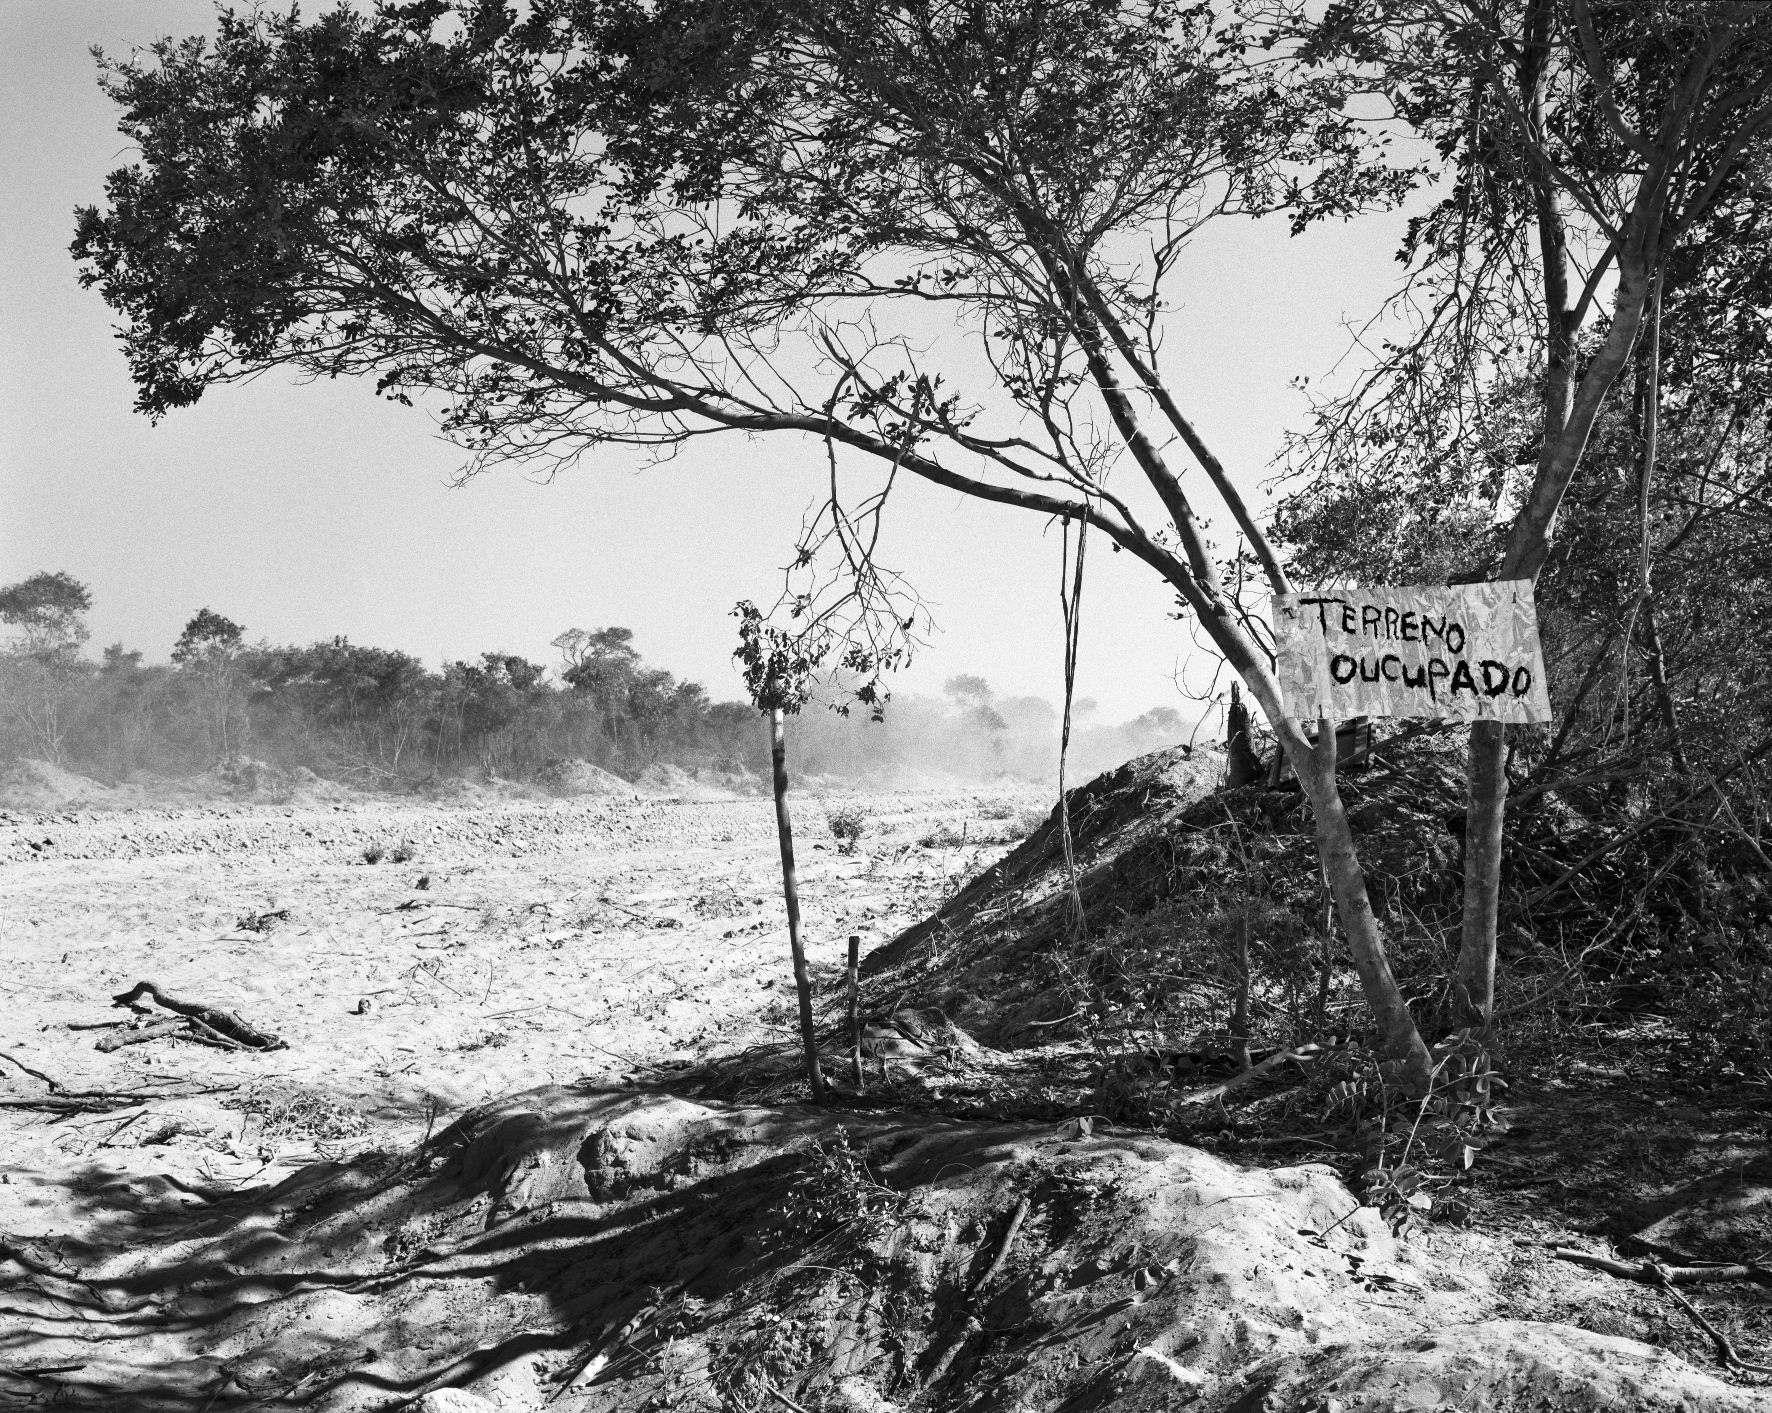 On the road to Cuito Cuanavale III, As Terras do Fim do Mundo, 2009